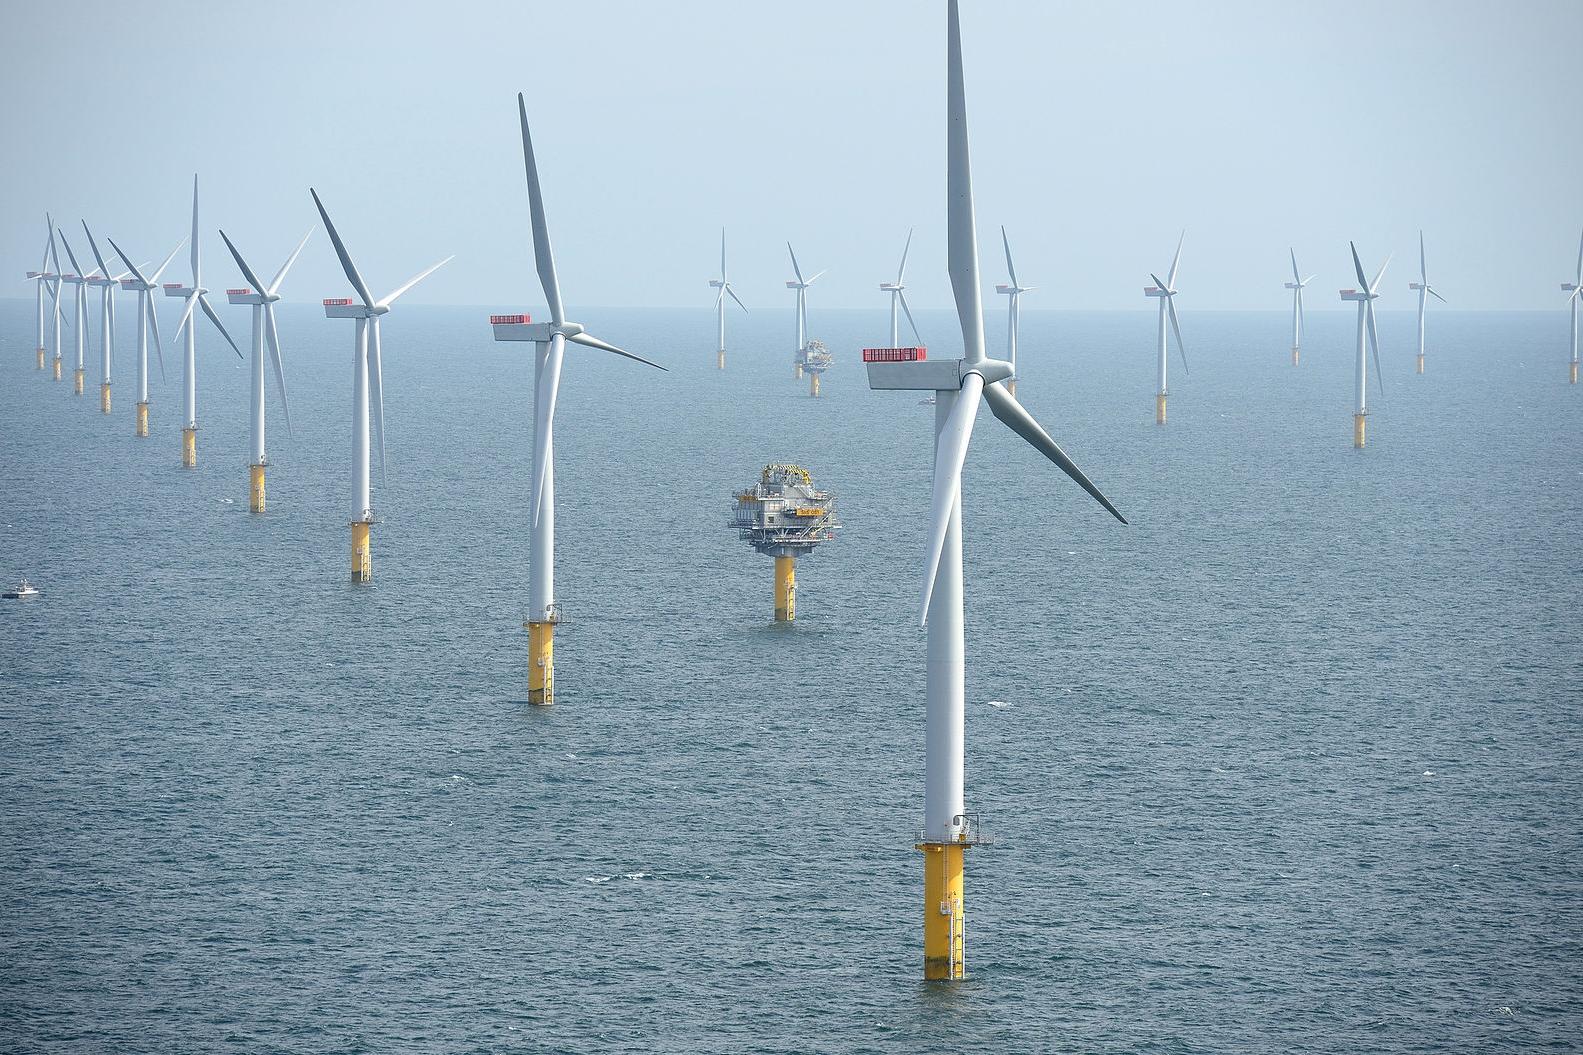 remote-robotics-offshore-wind